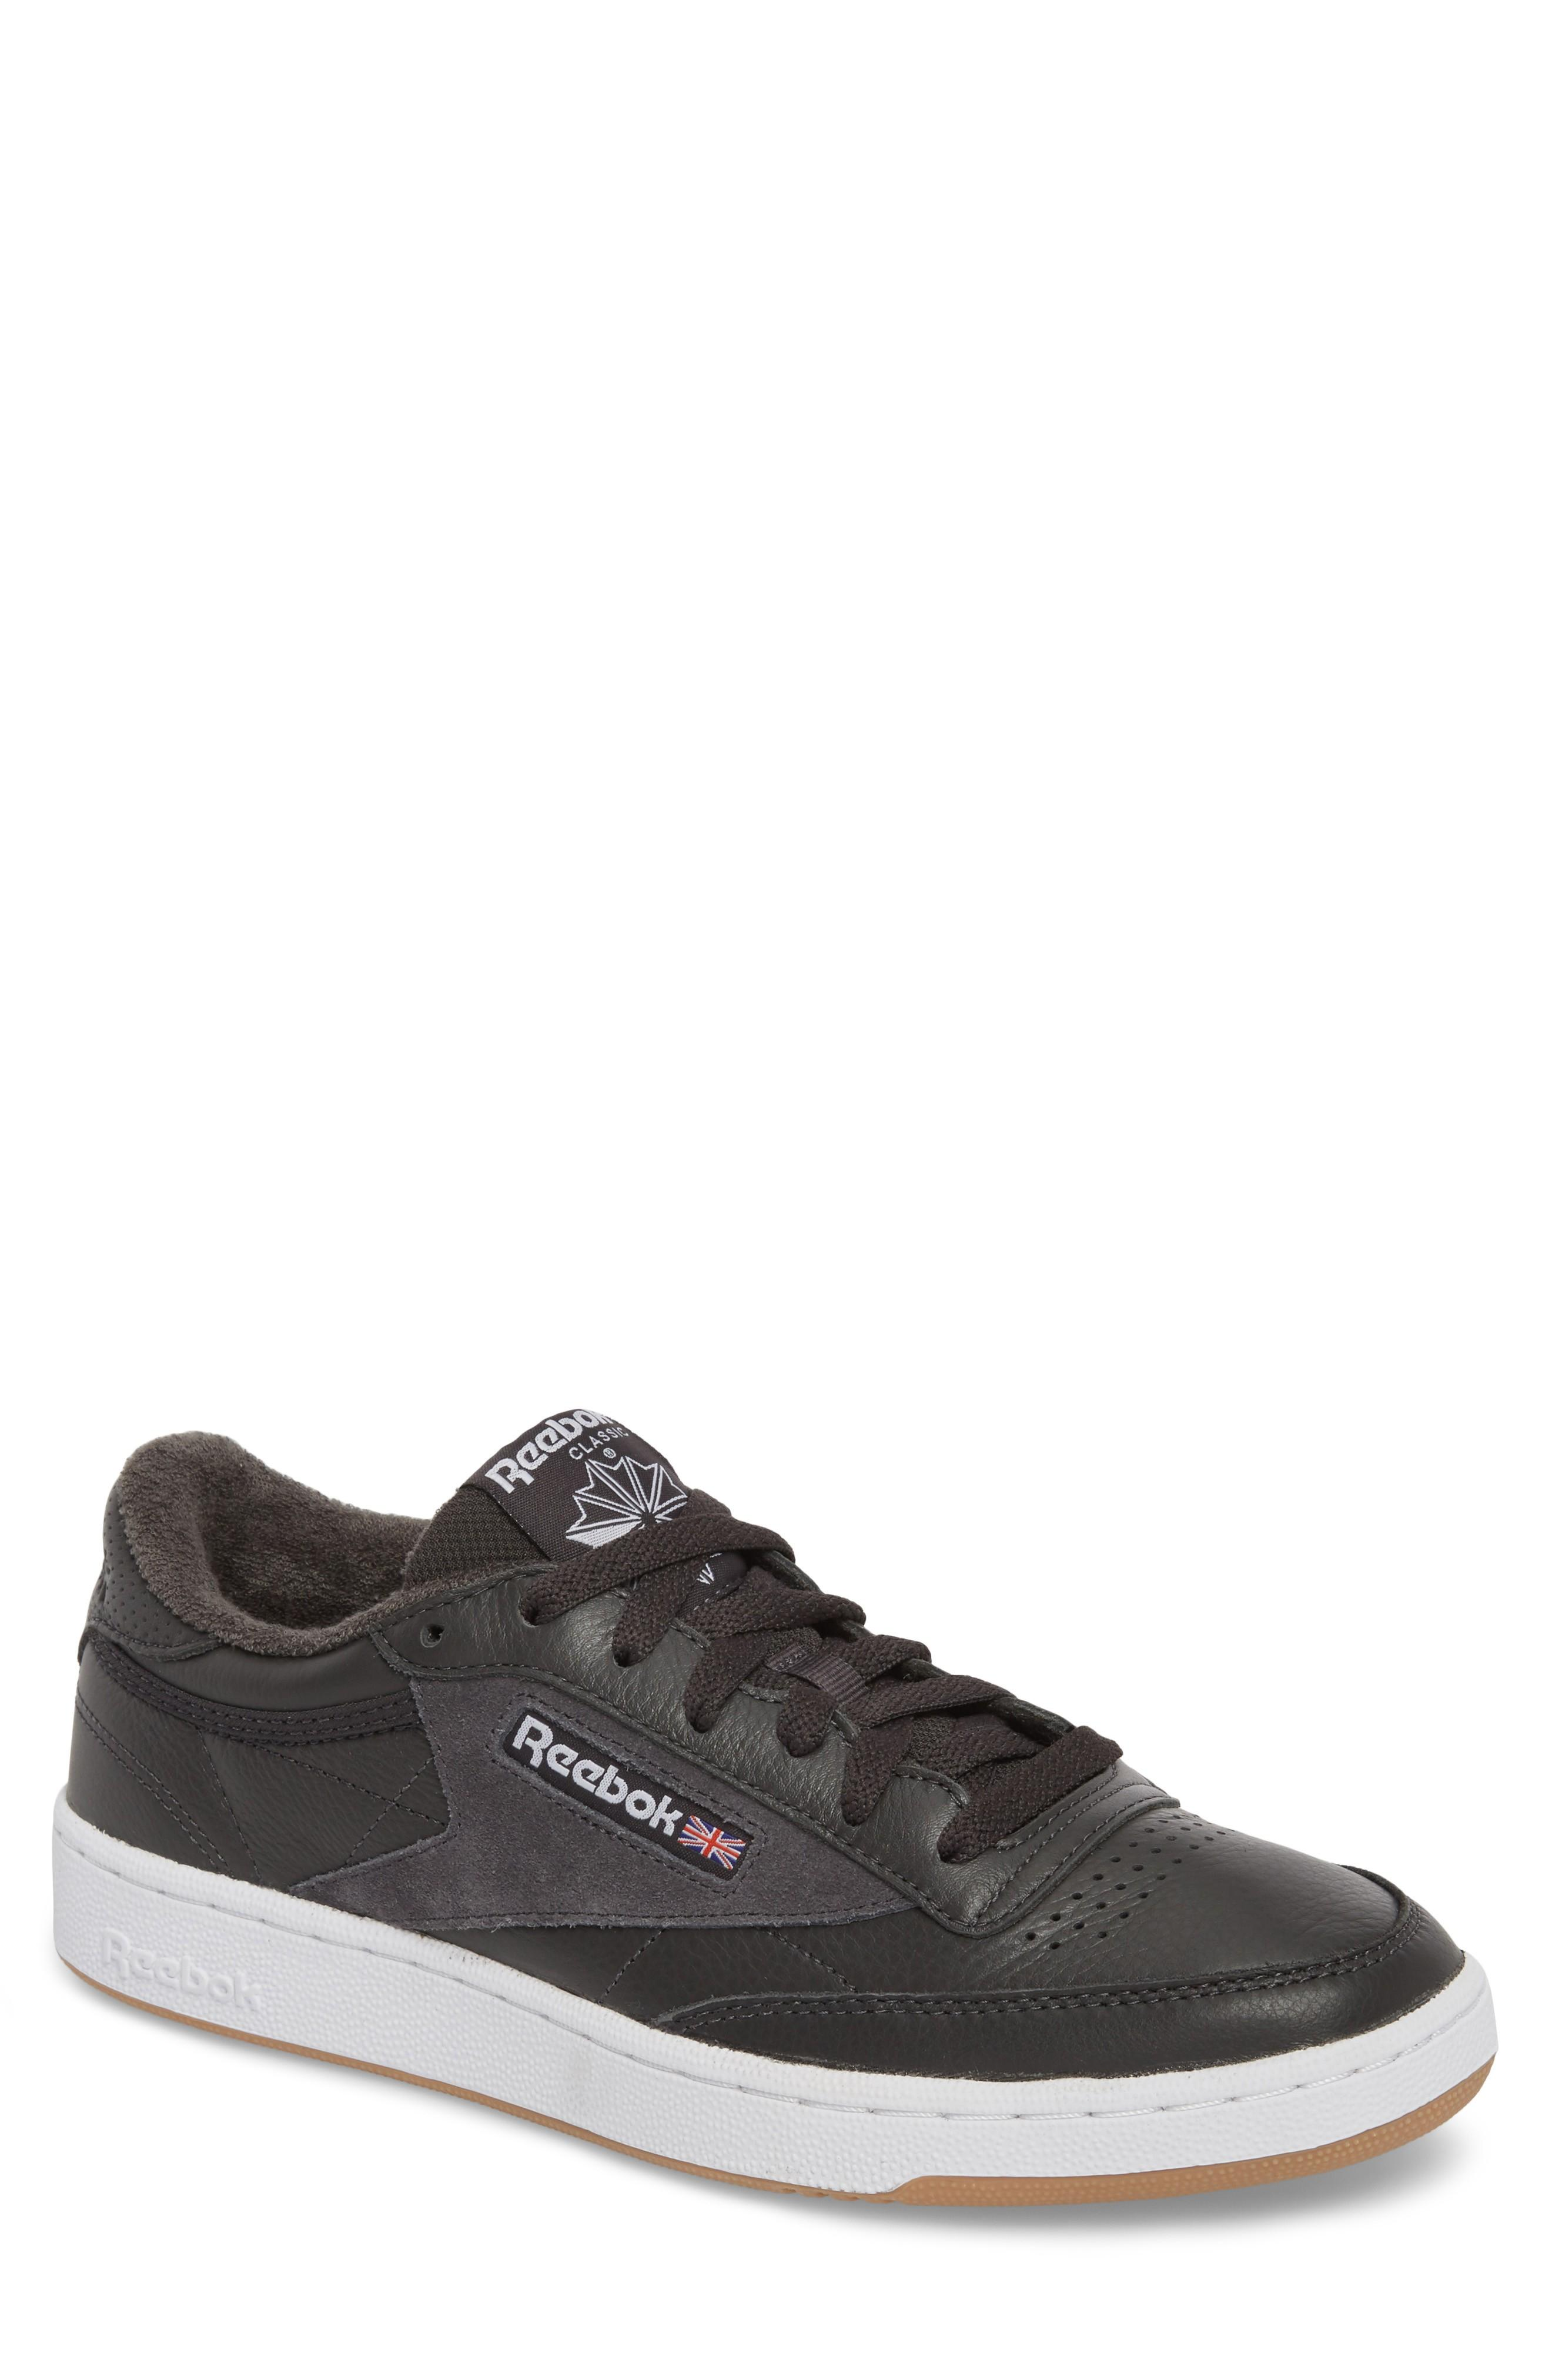 9986250571d Reebok Club C 85 Estl Sneaker In Coal  White  Washed Blue